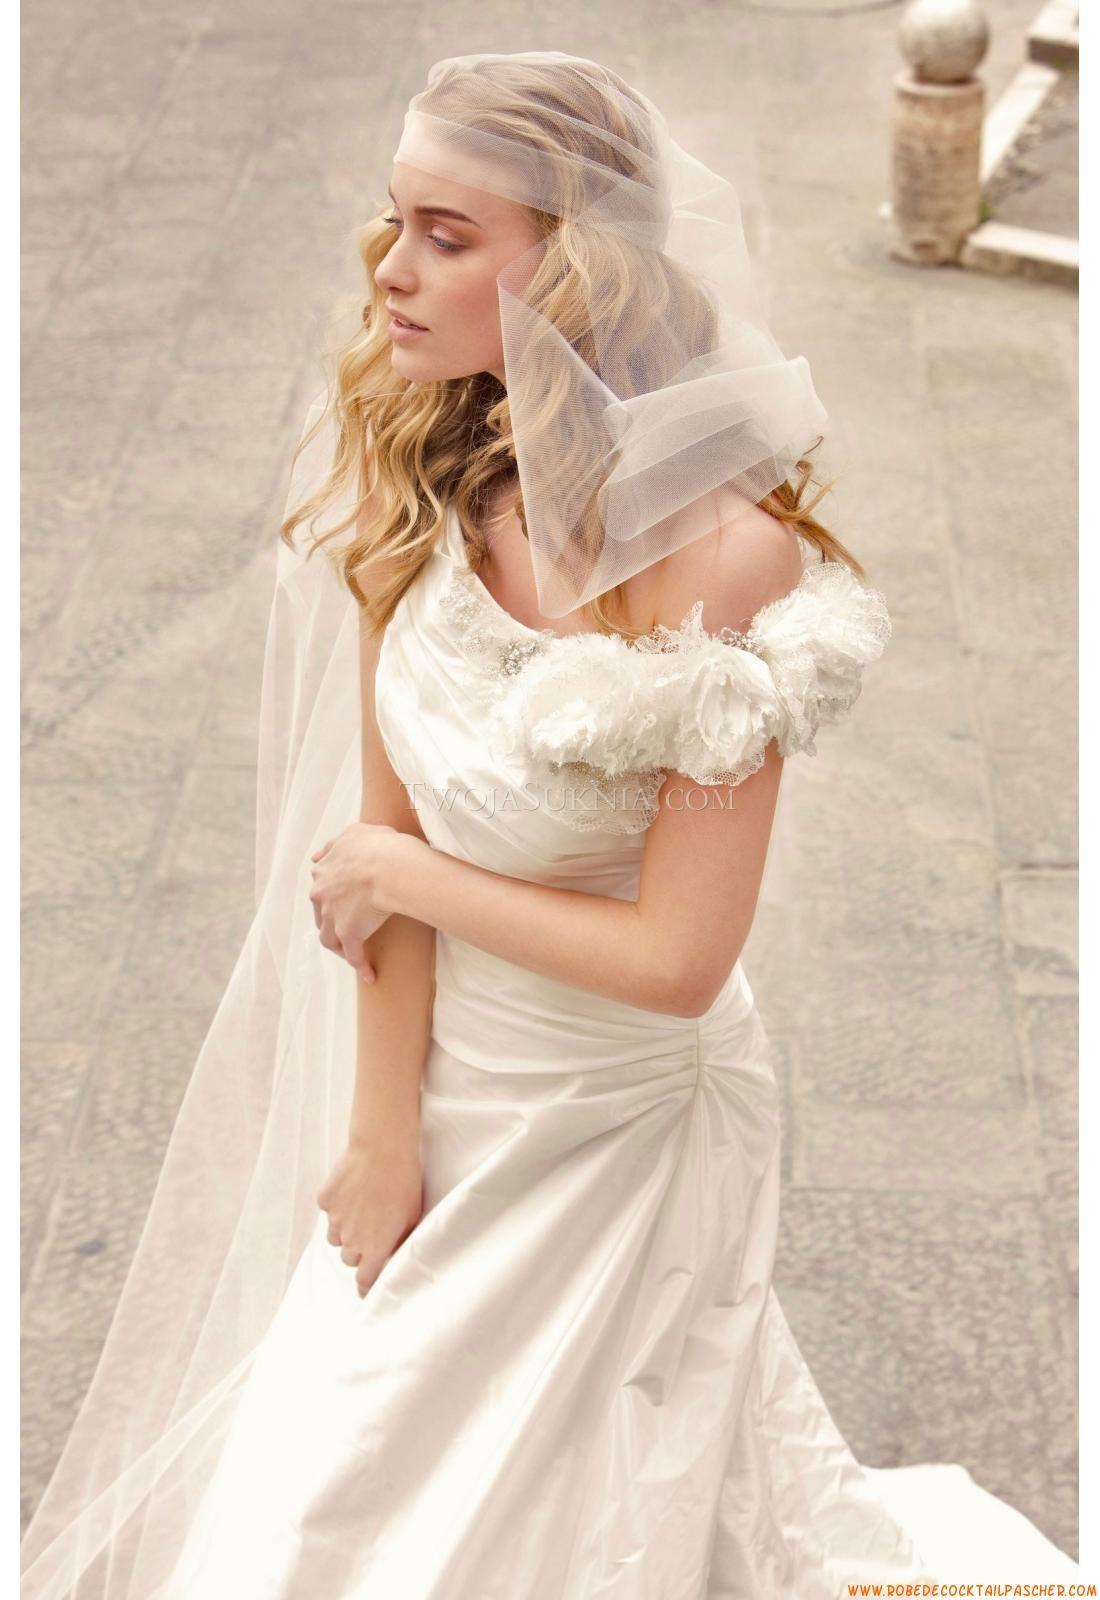 Robe de mariée Rembo Styling Sunshine 2012 | robe de mariée ...